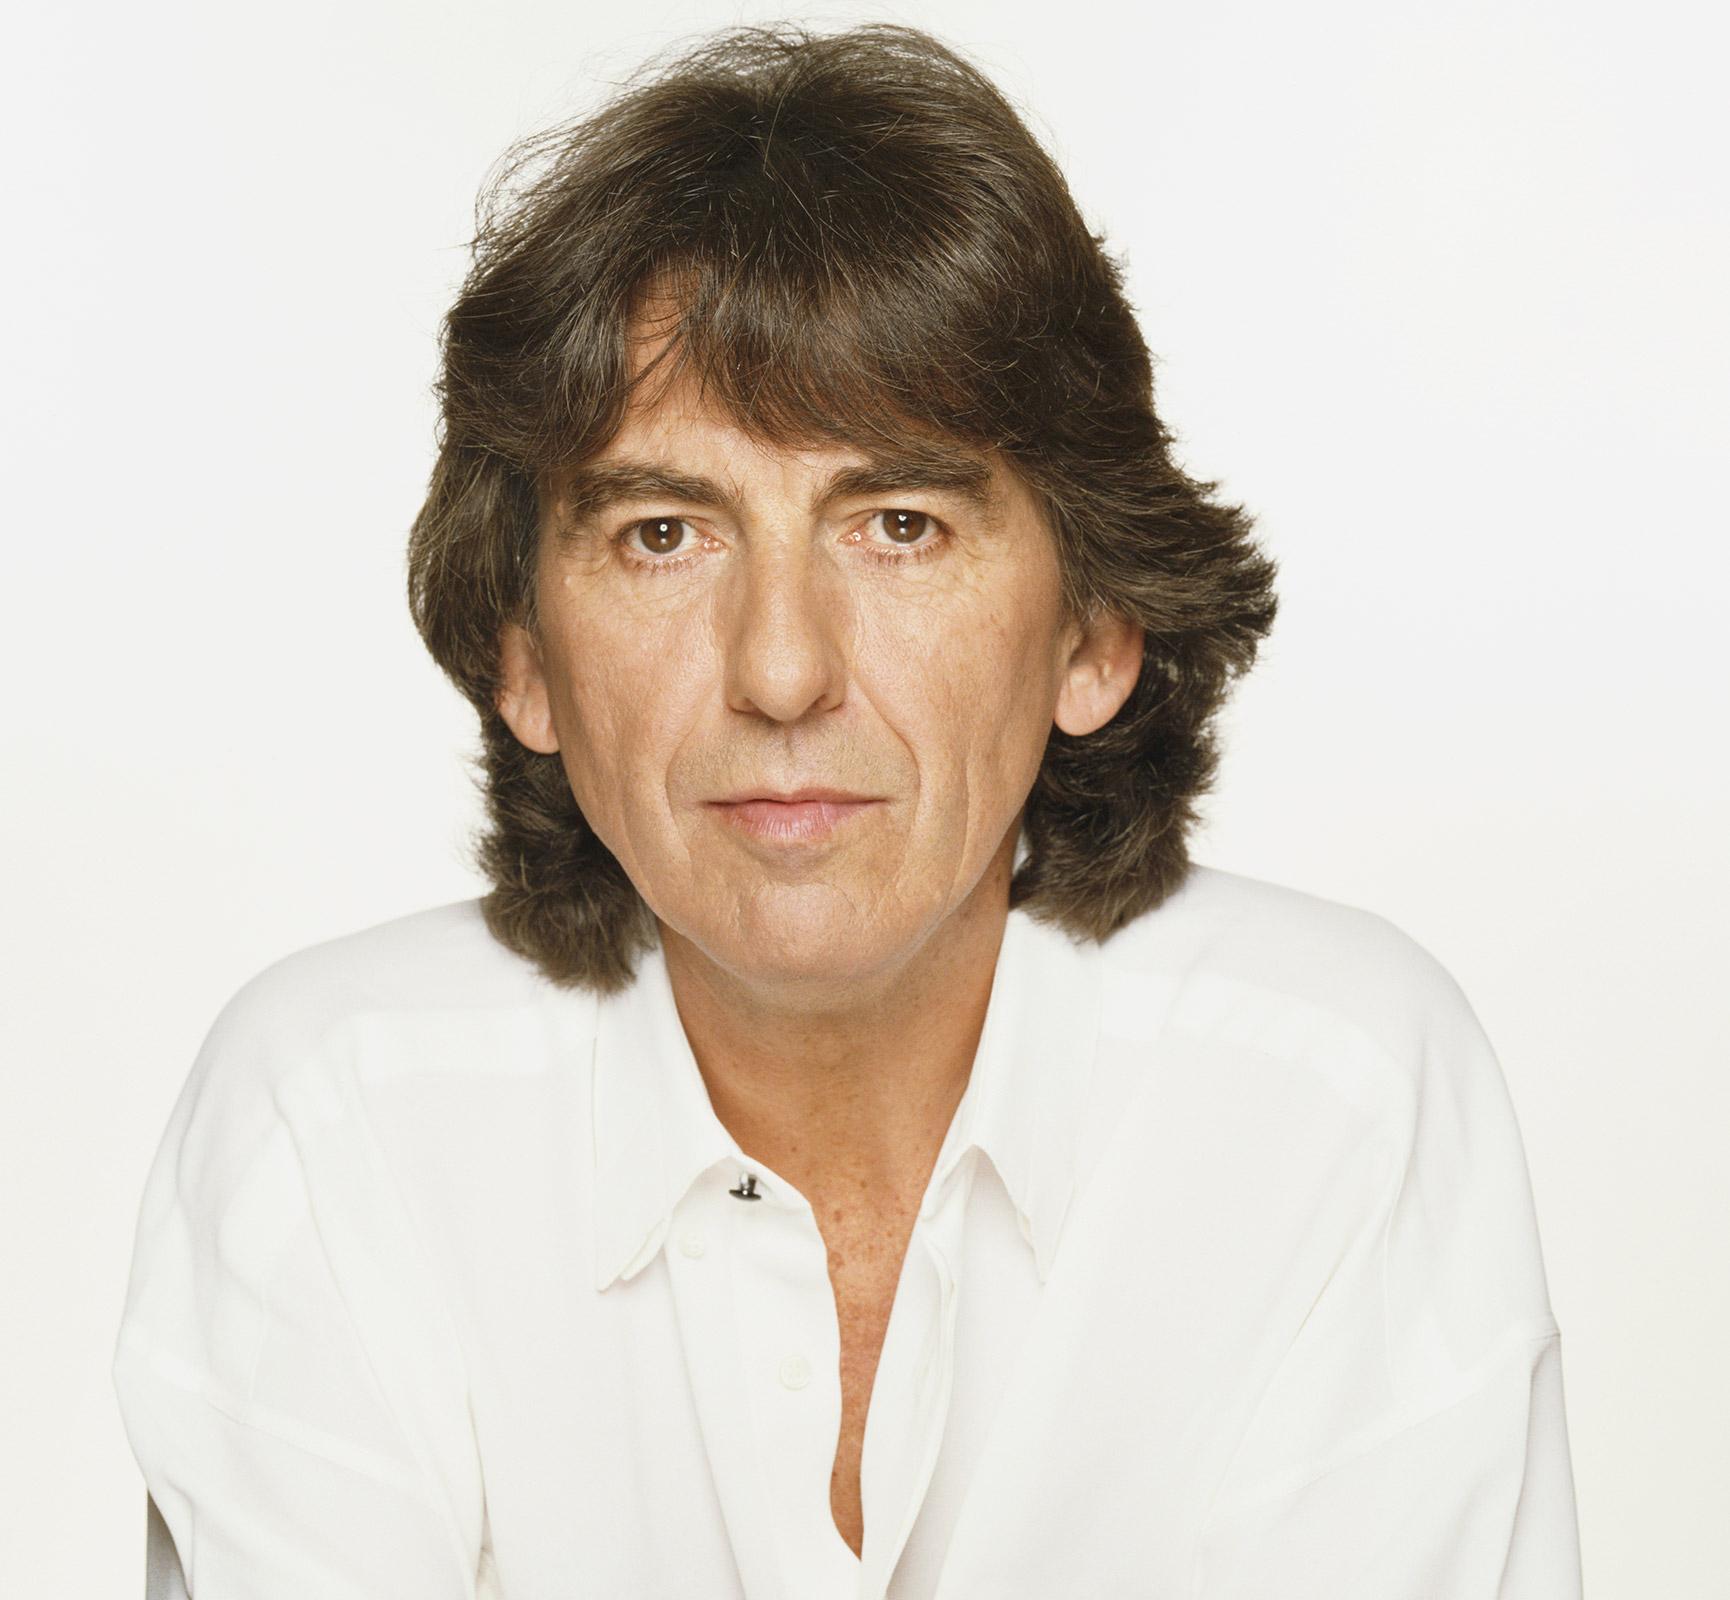 Guitarist George Harrison - age: 58